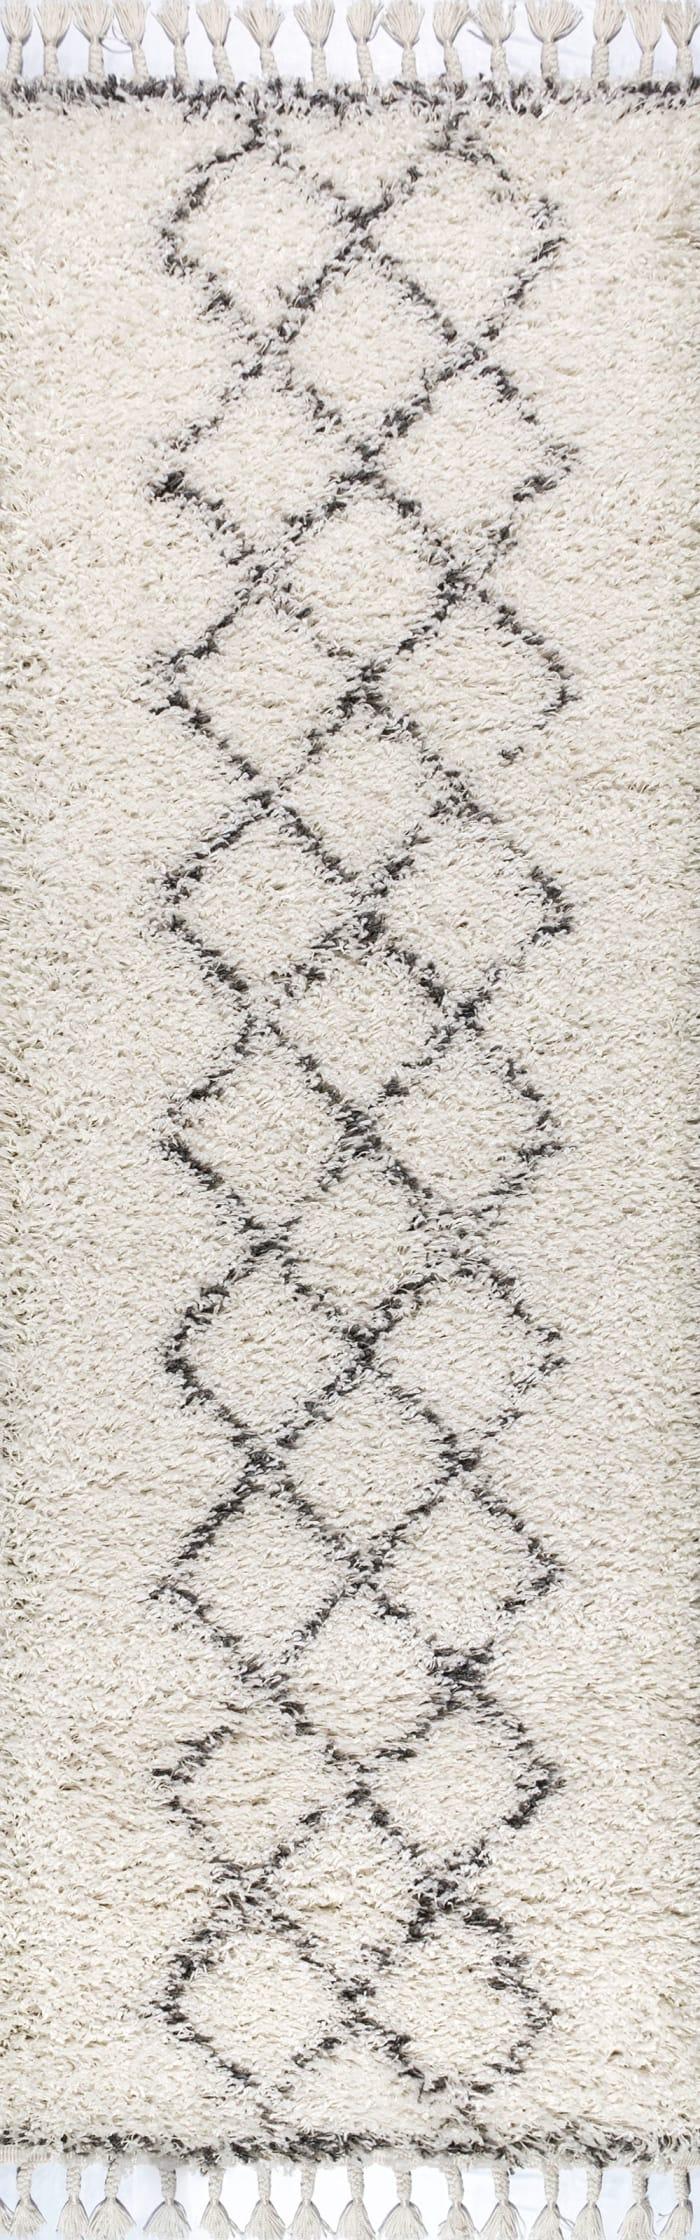 Shag Plush Tassel Moroccan Tribal Geometric Trellis Cream/Grey Runner Rug